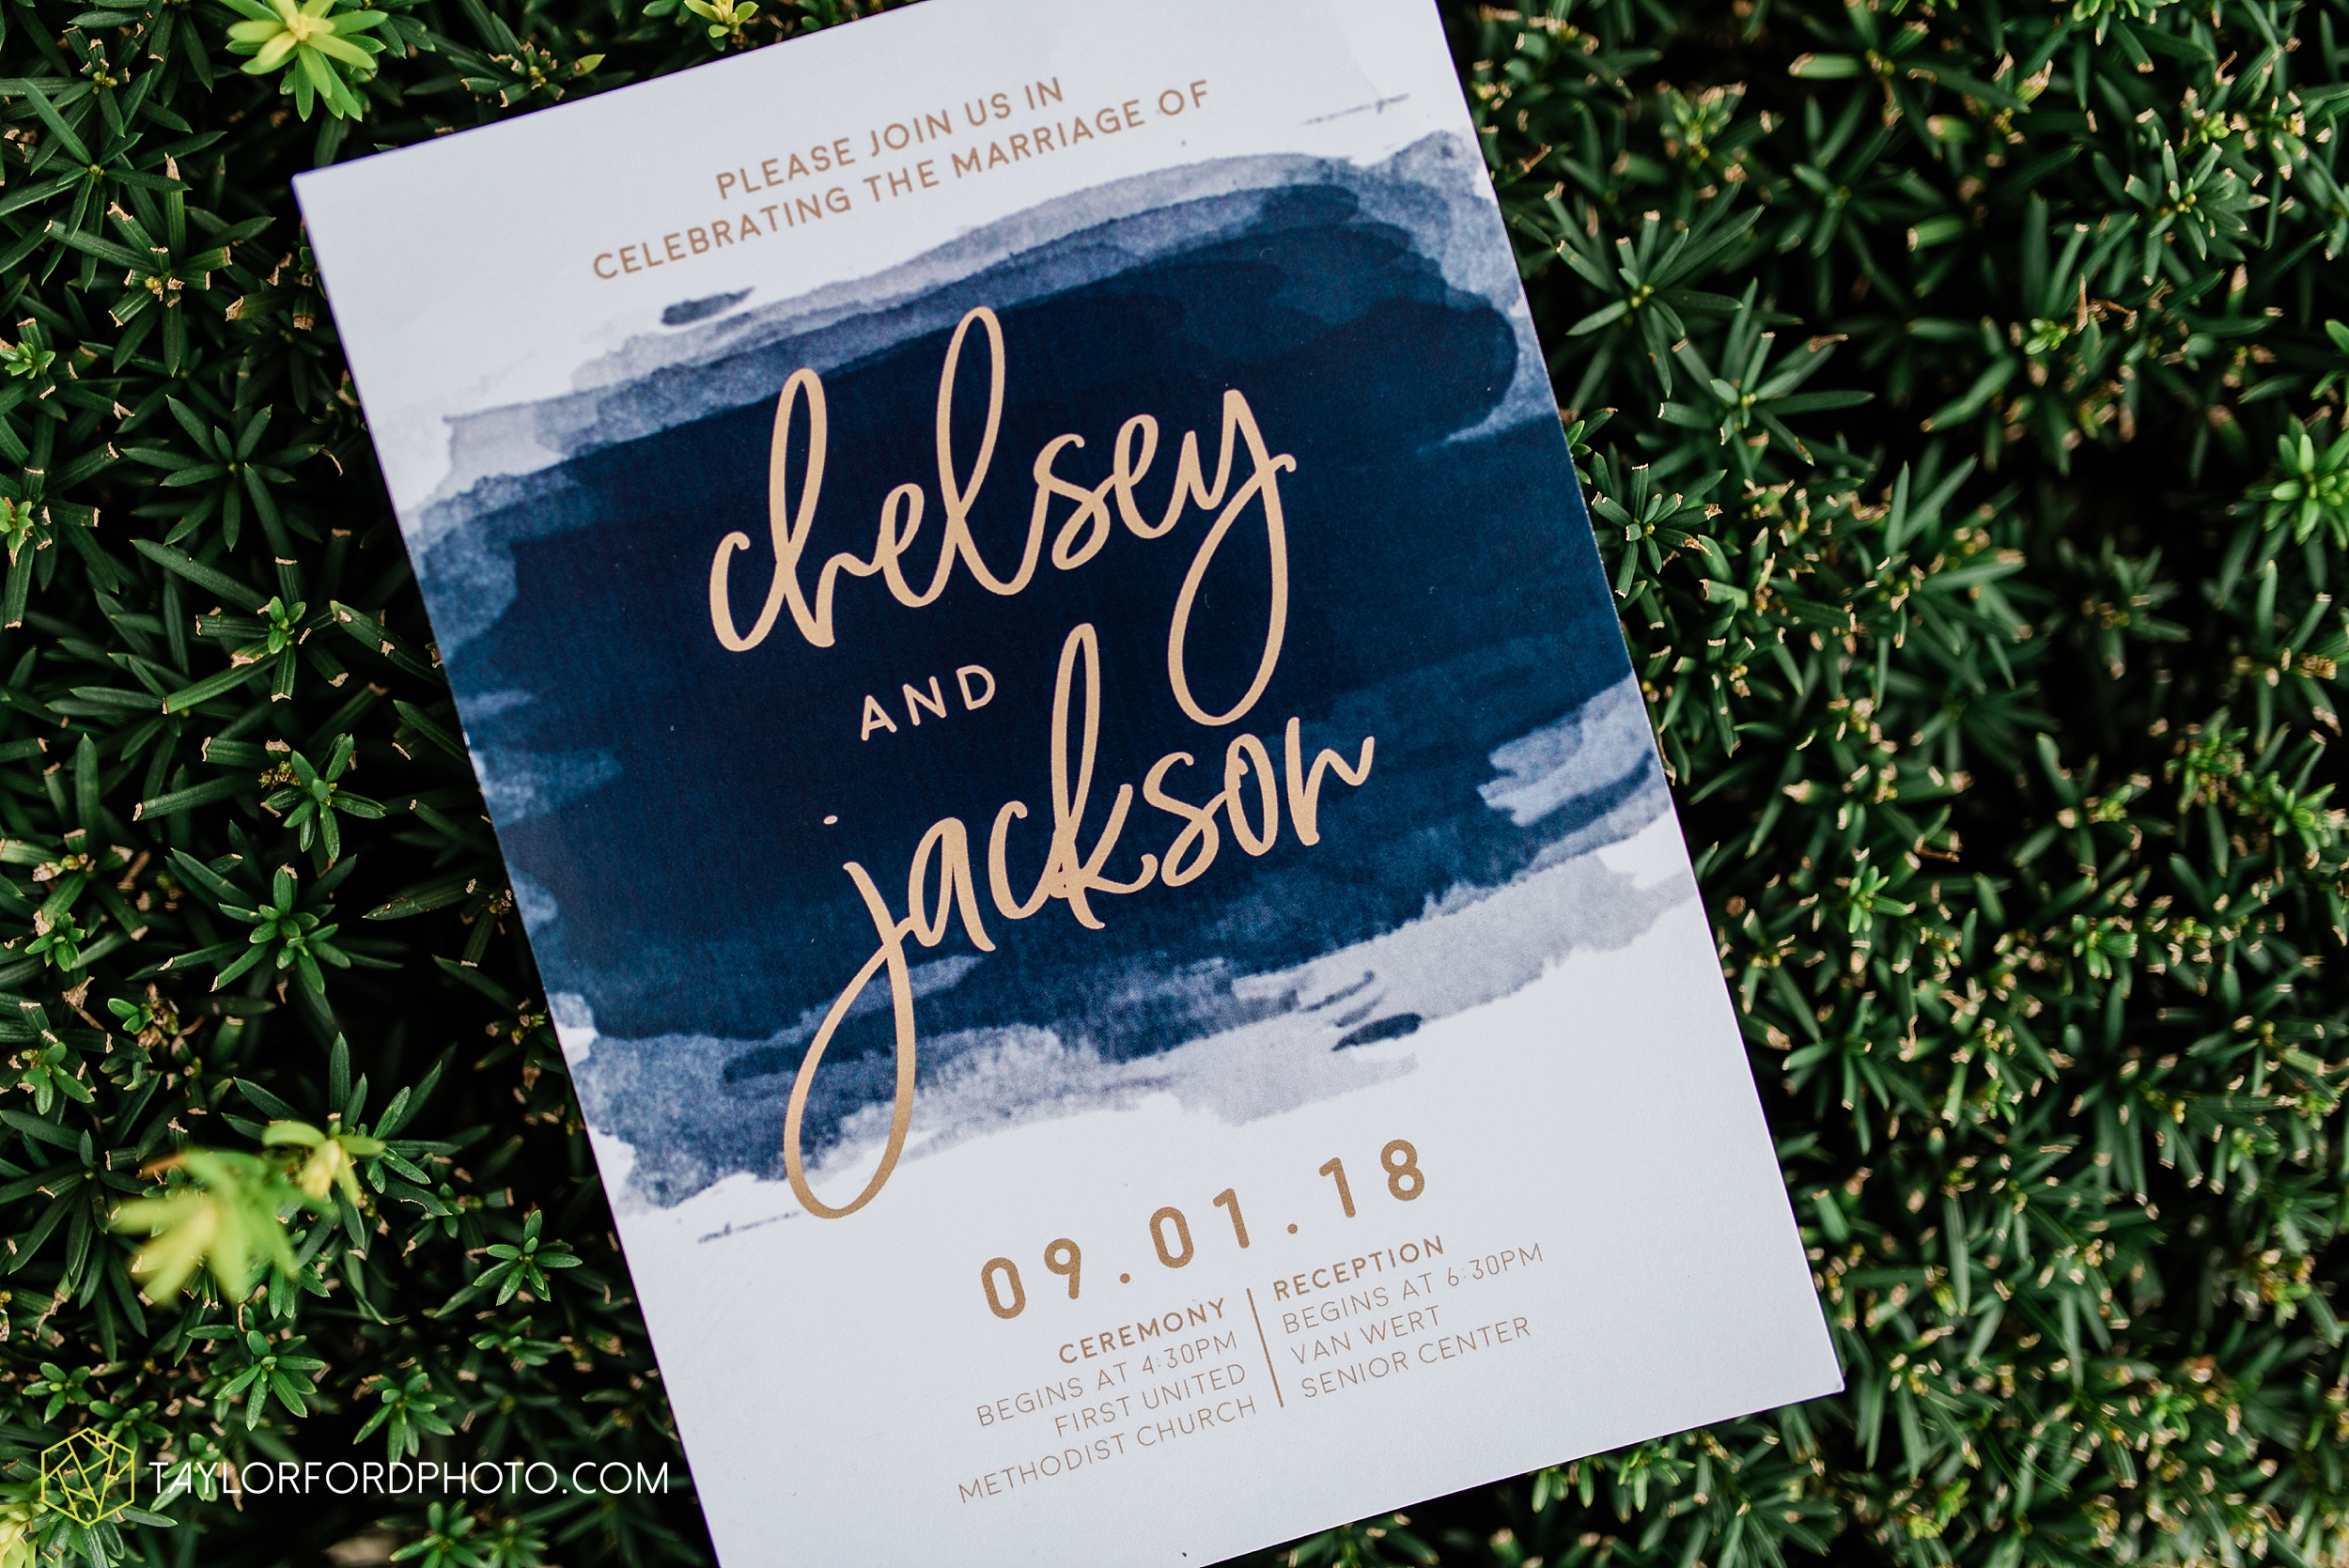 chelsey-zosh-jackson-young-first-united-methodist-church-senior-center-van-wert-ohio-wedding-photographer-taylor-ford-photography_0043.jpg